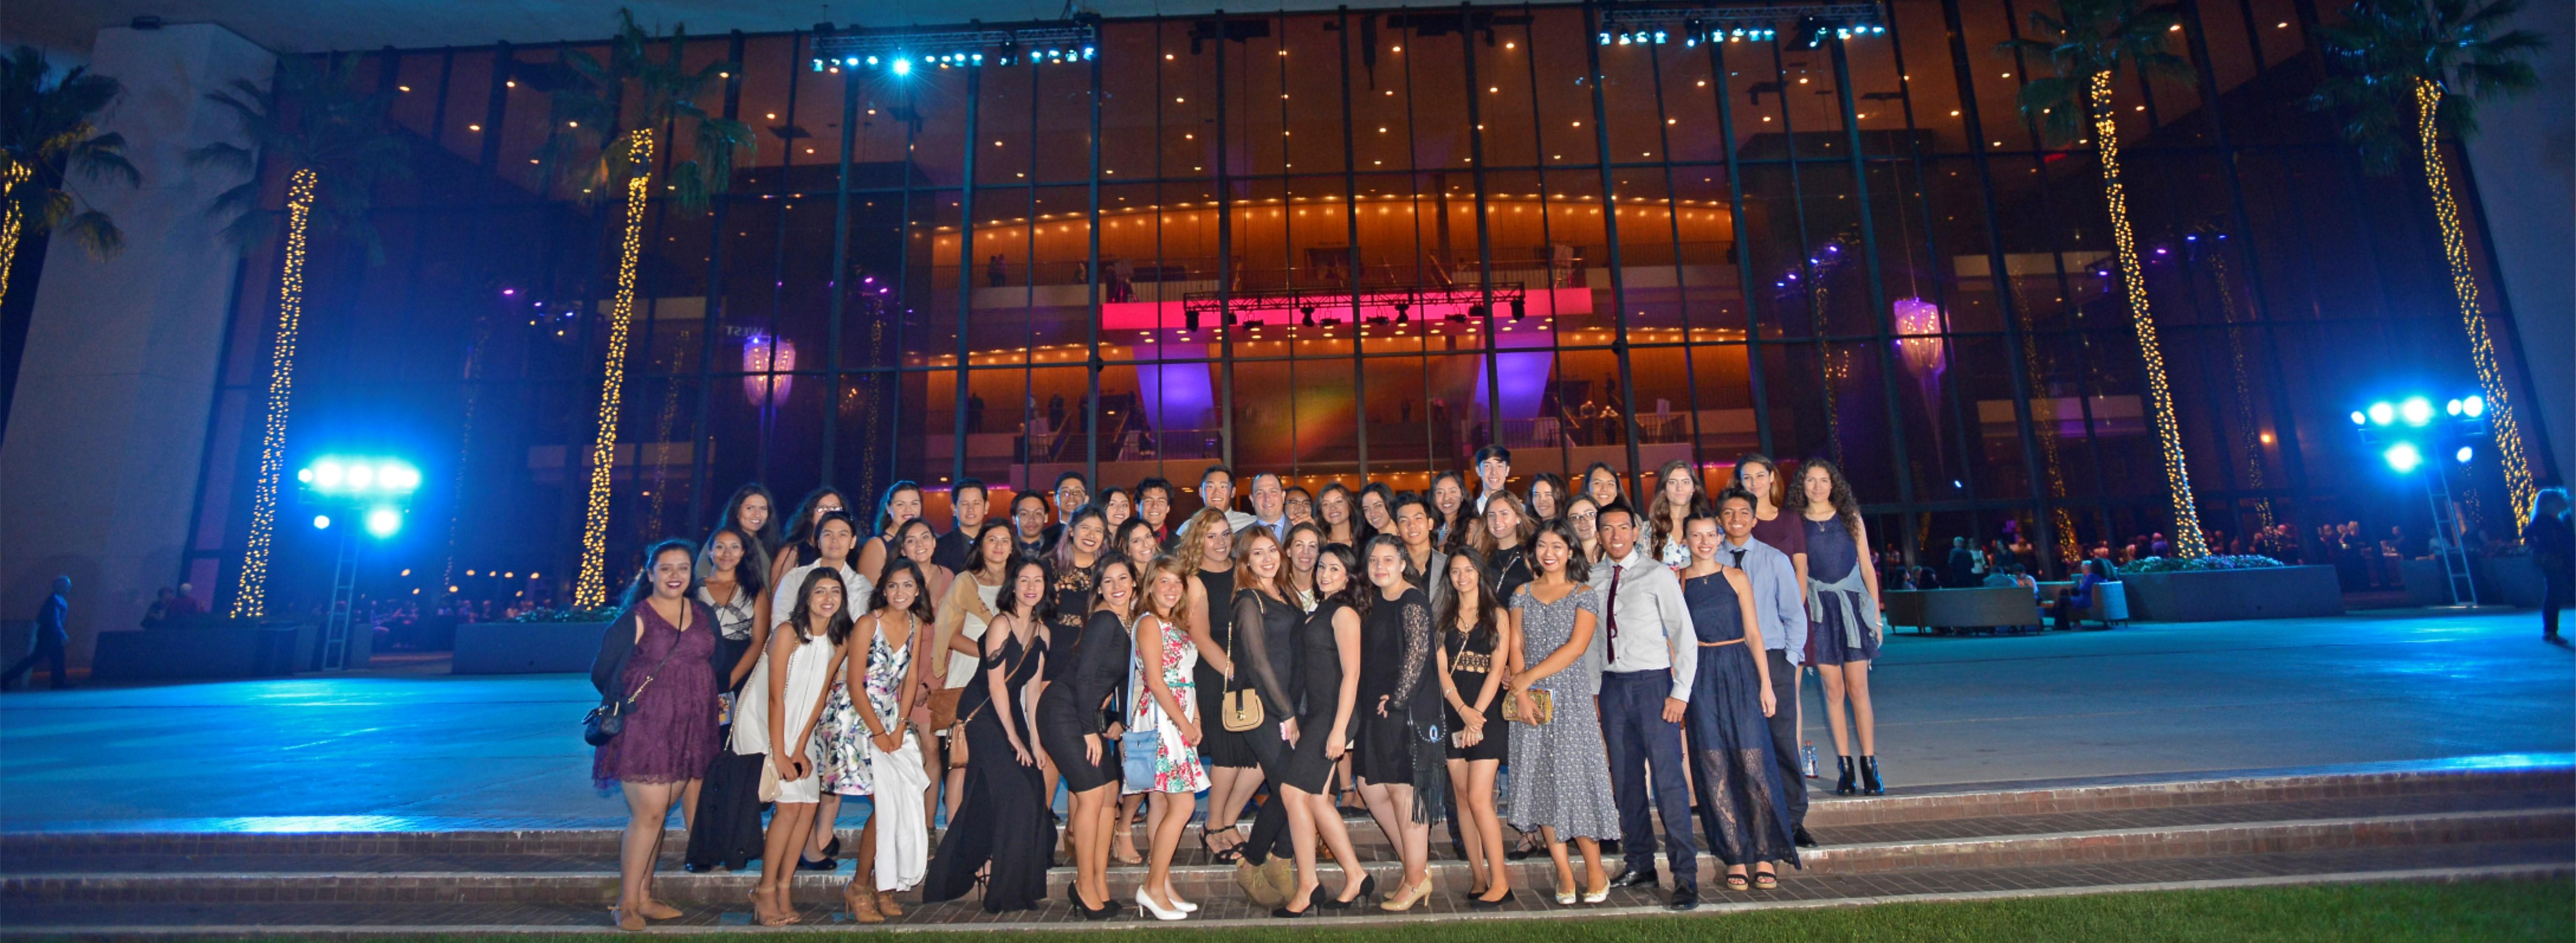 Long Beach Symphony Family Concert